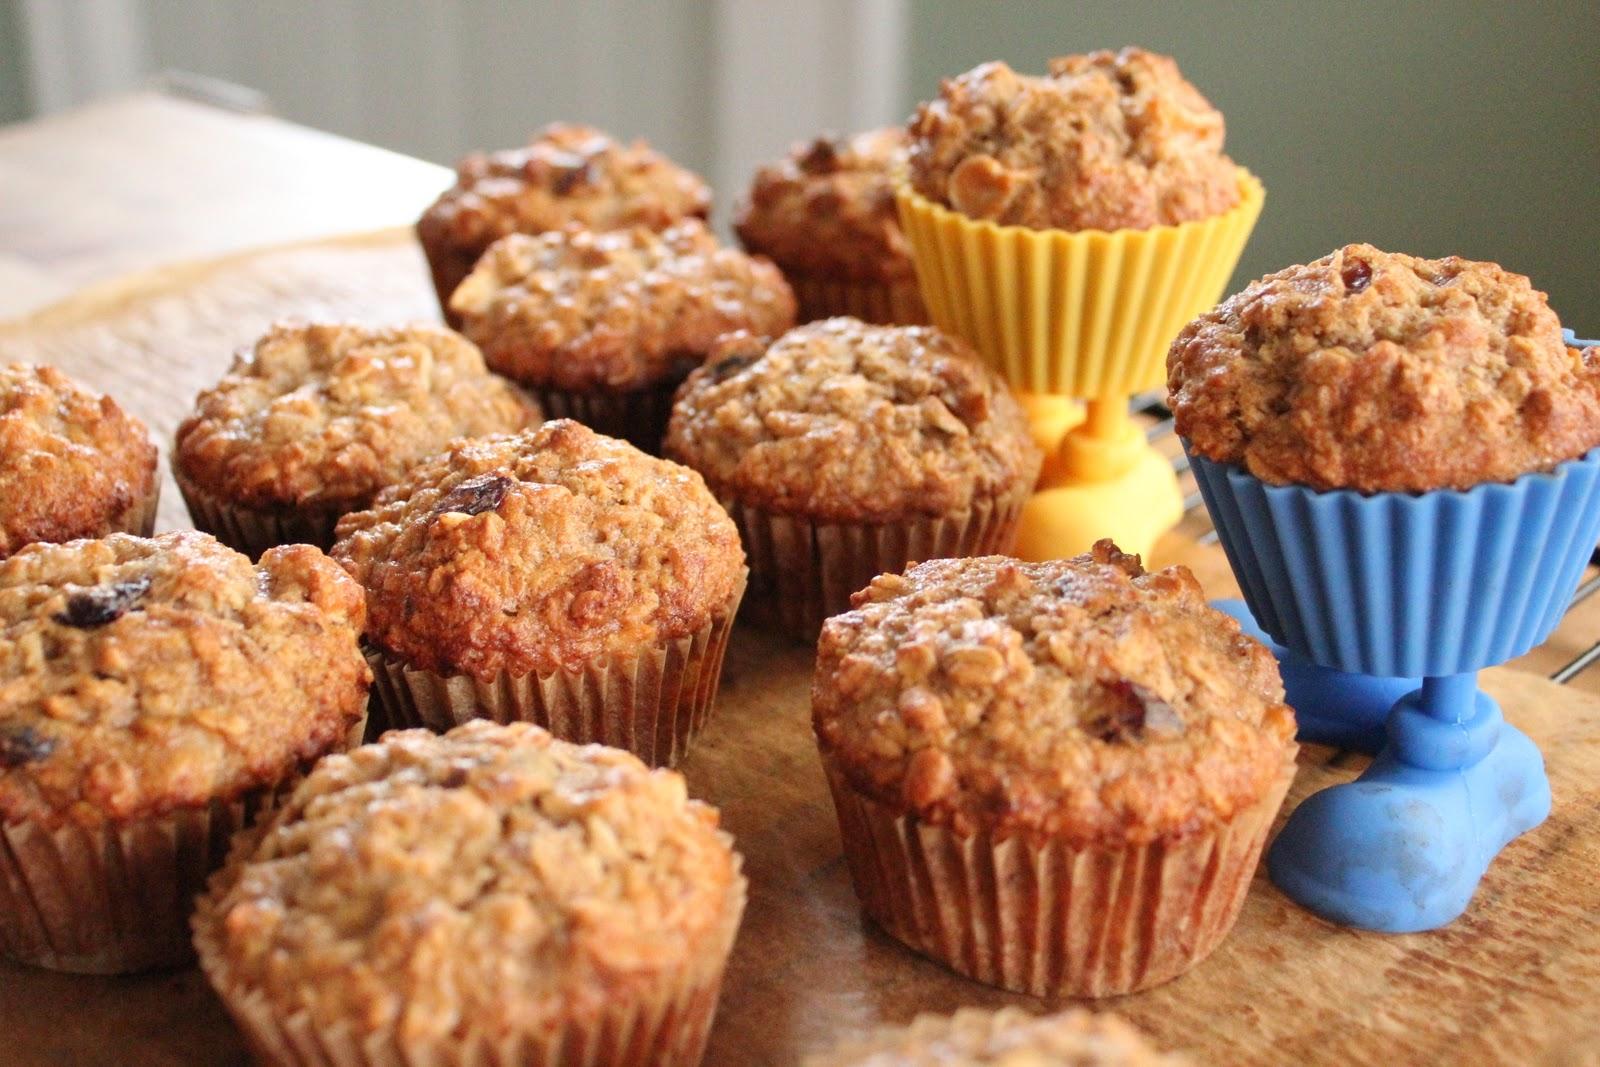 banana, apple and oatmeal muffins